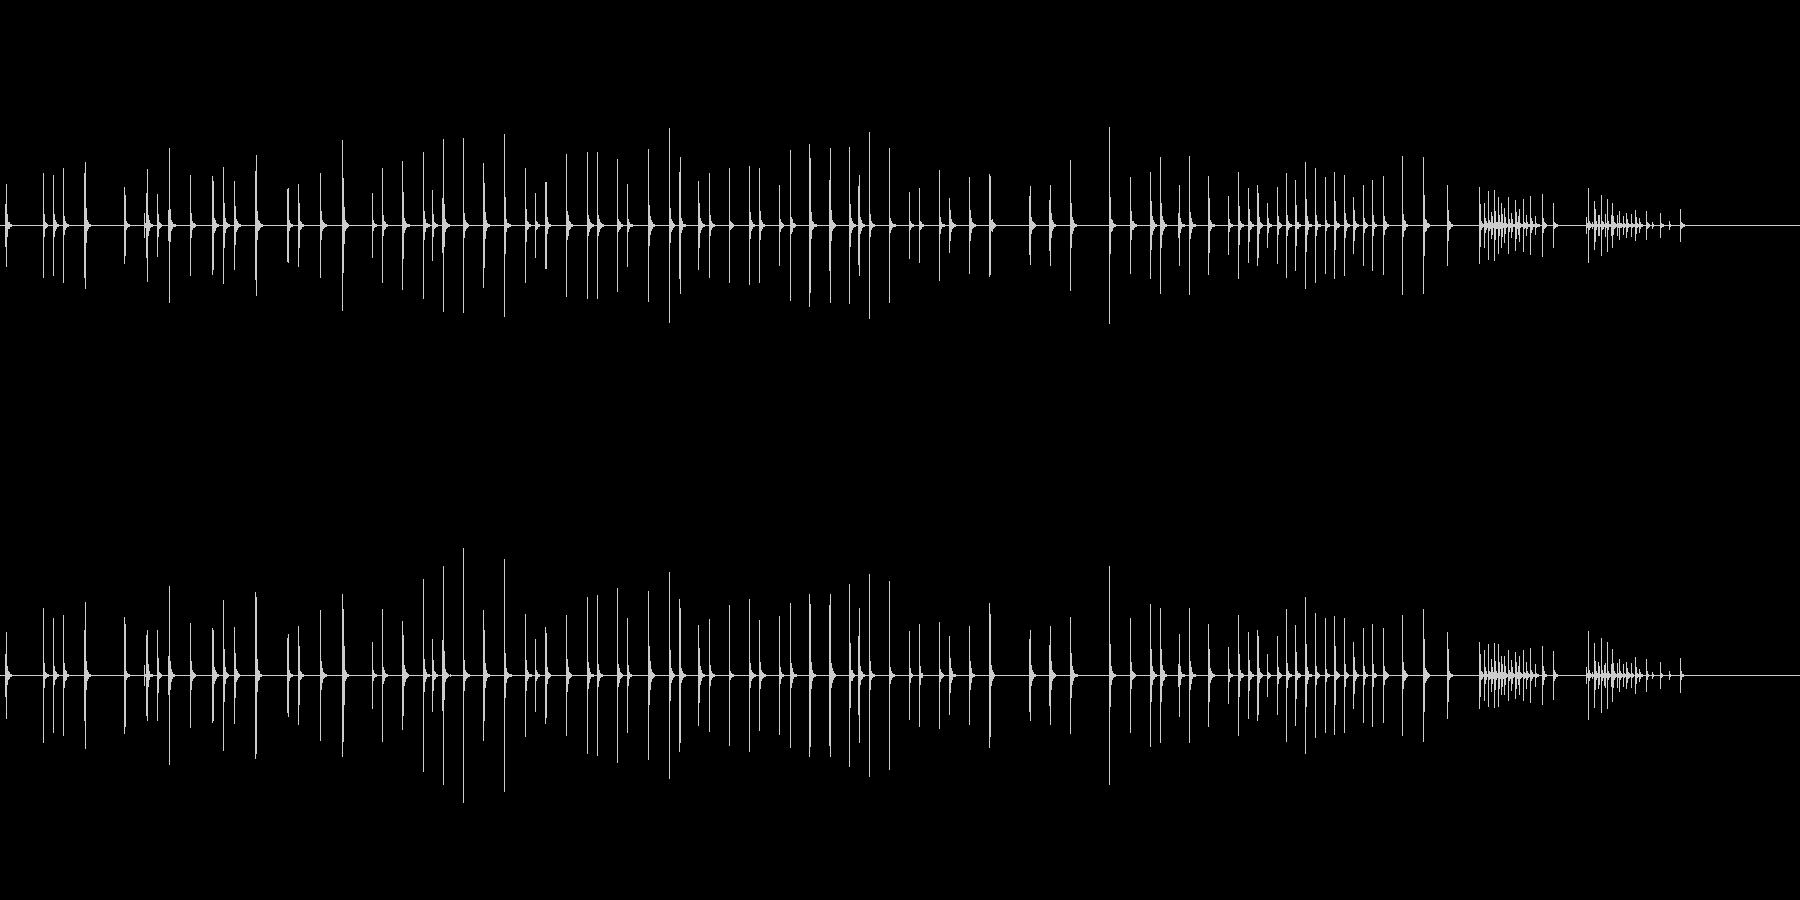 木琴8歌舞伎黒御簾下座音楽和風日本マリンの未再生の波形